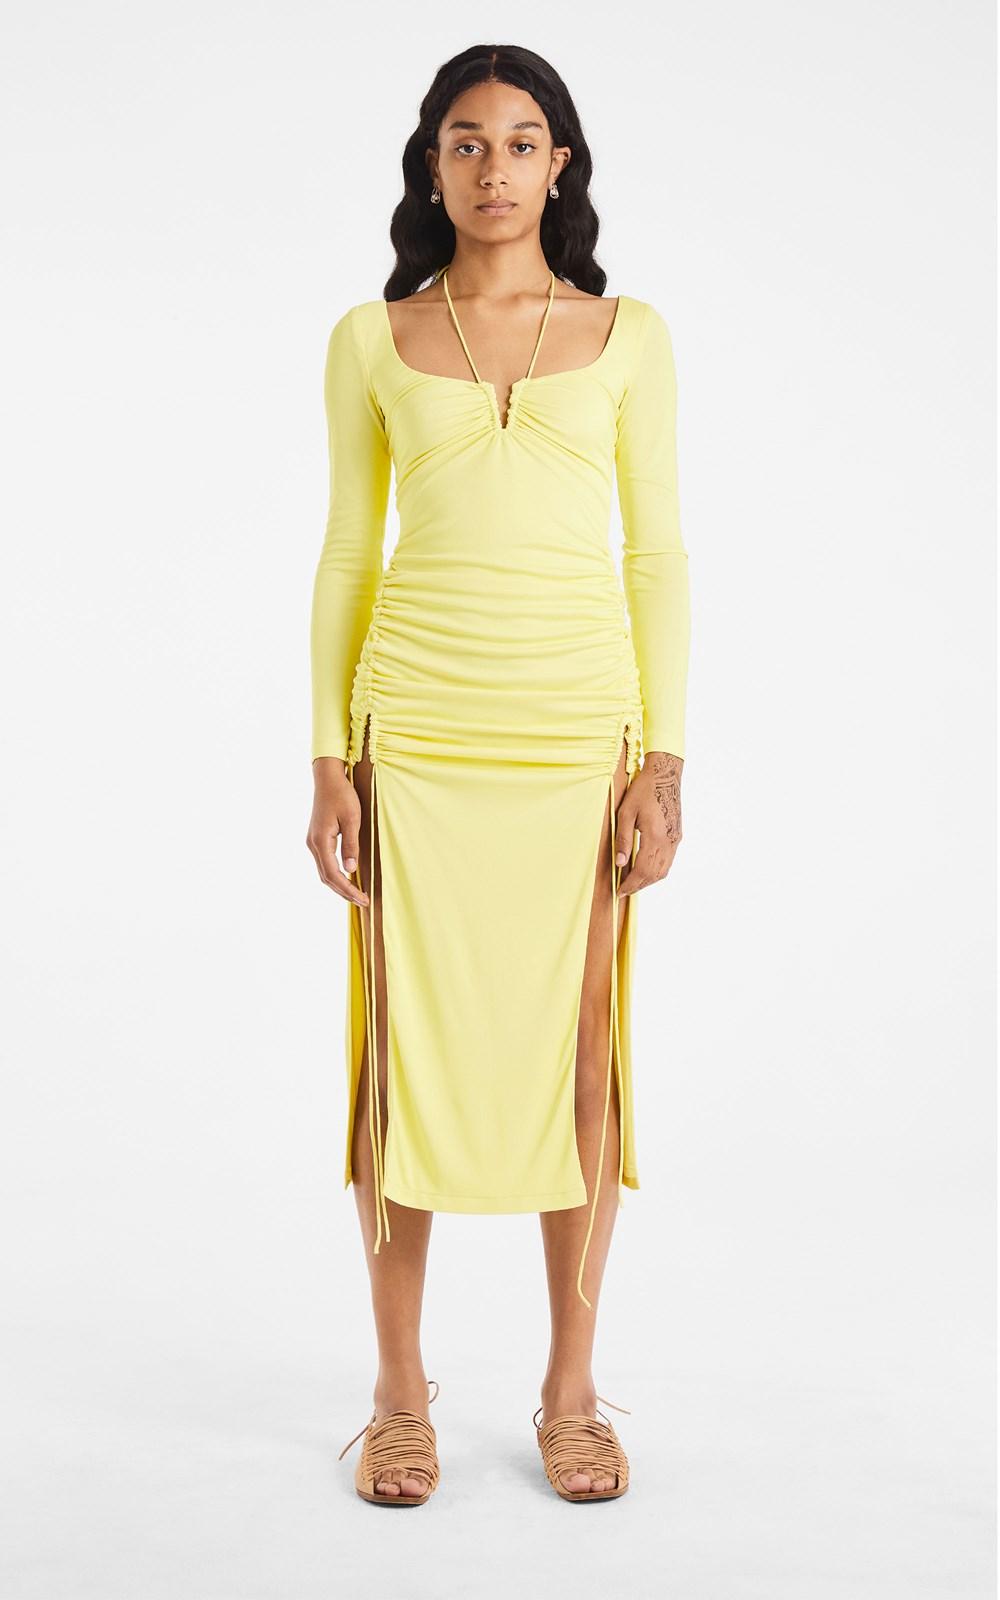 New  | SILK JERSEY WIRE DRESS